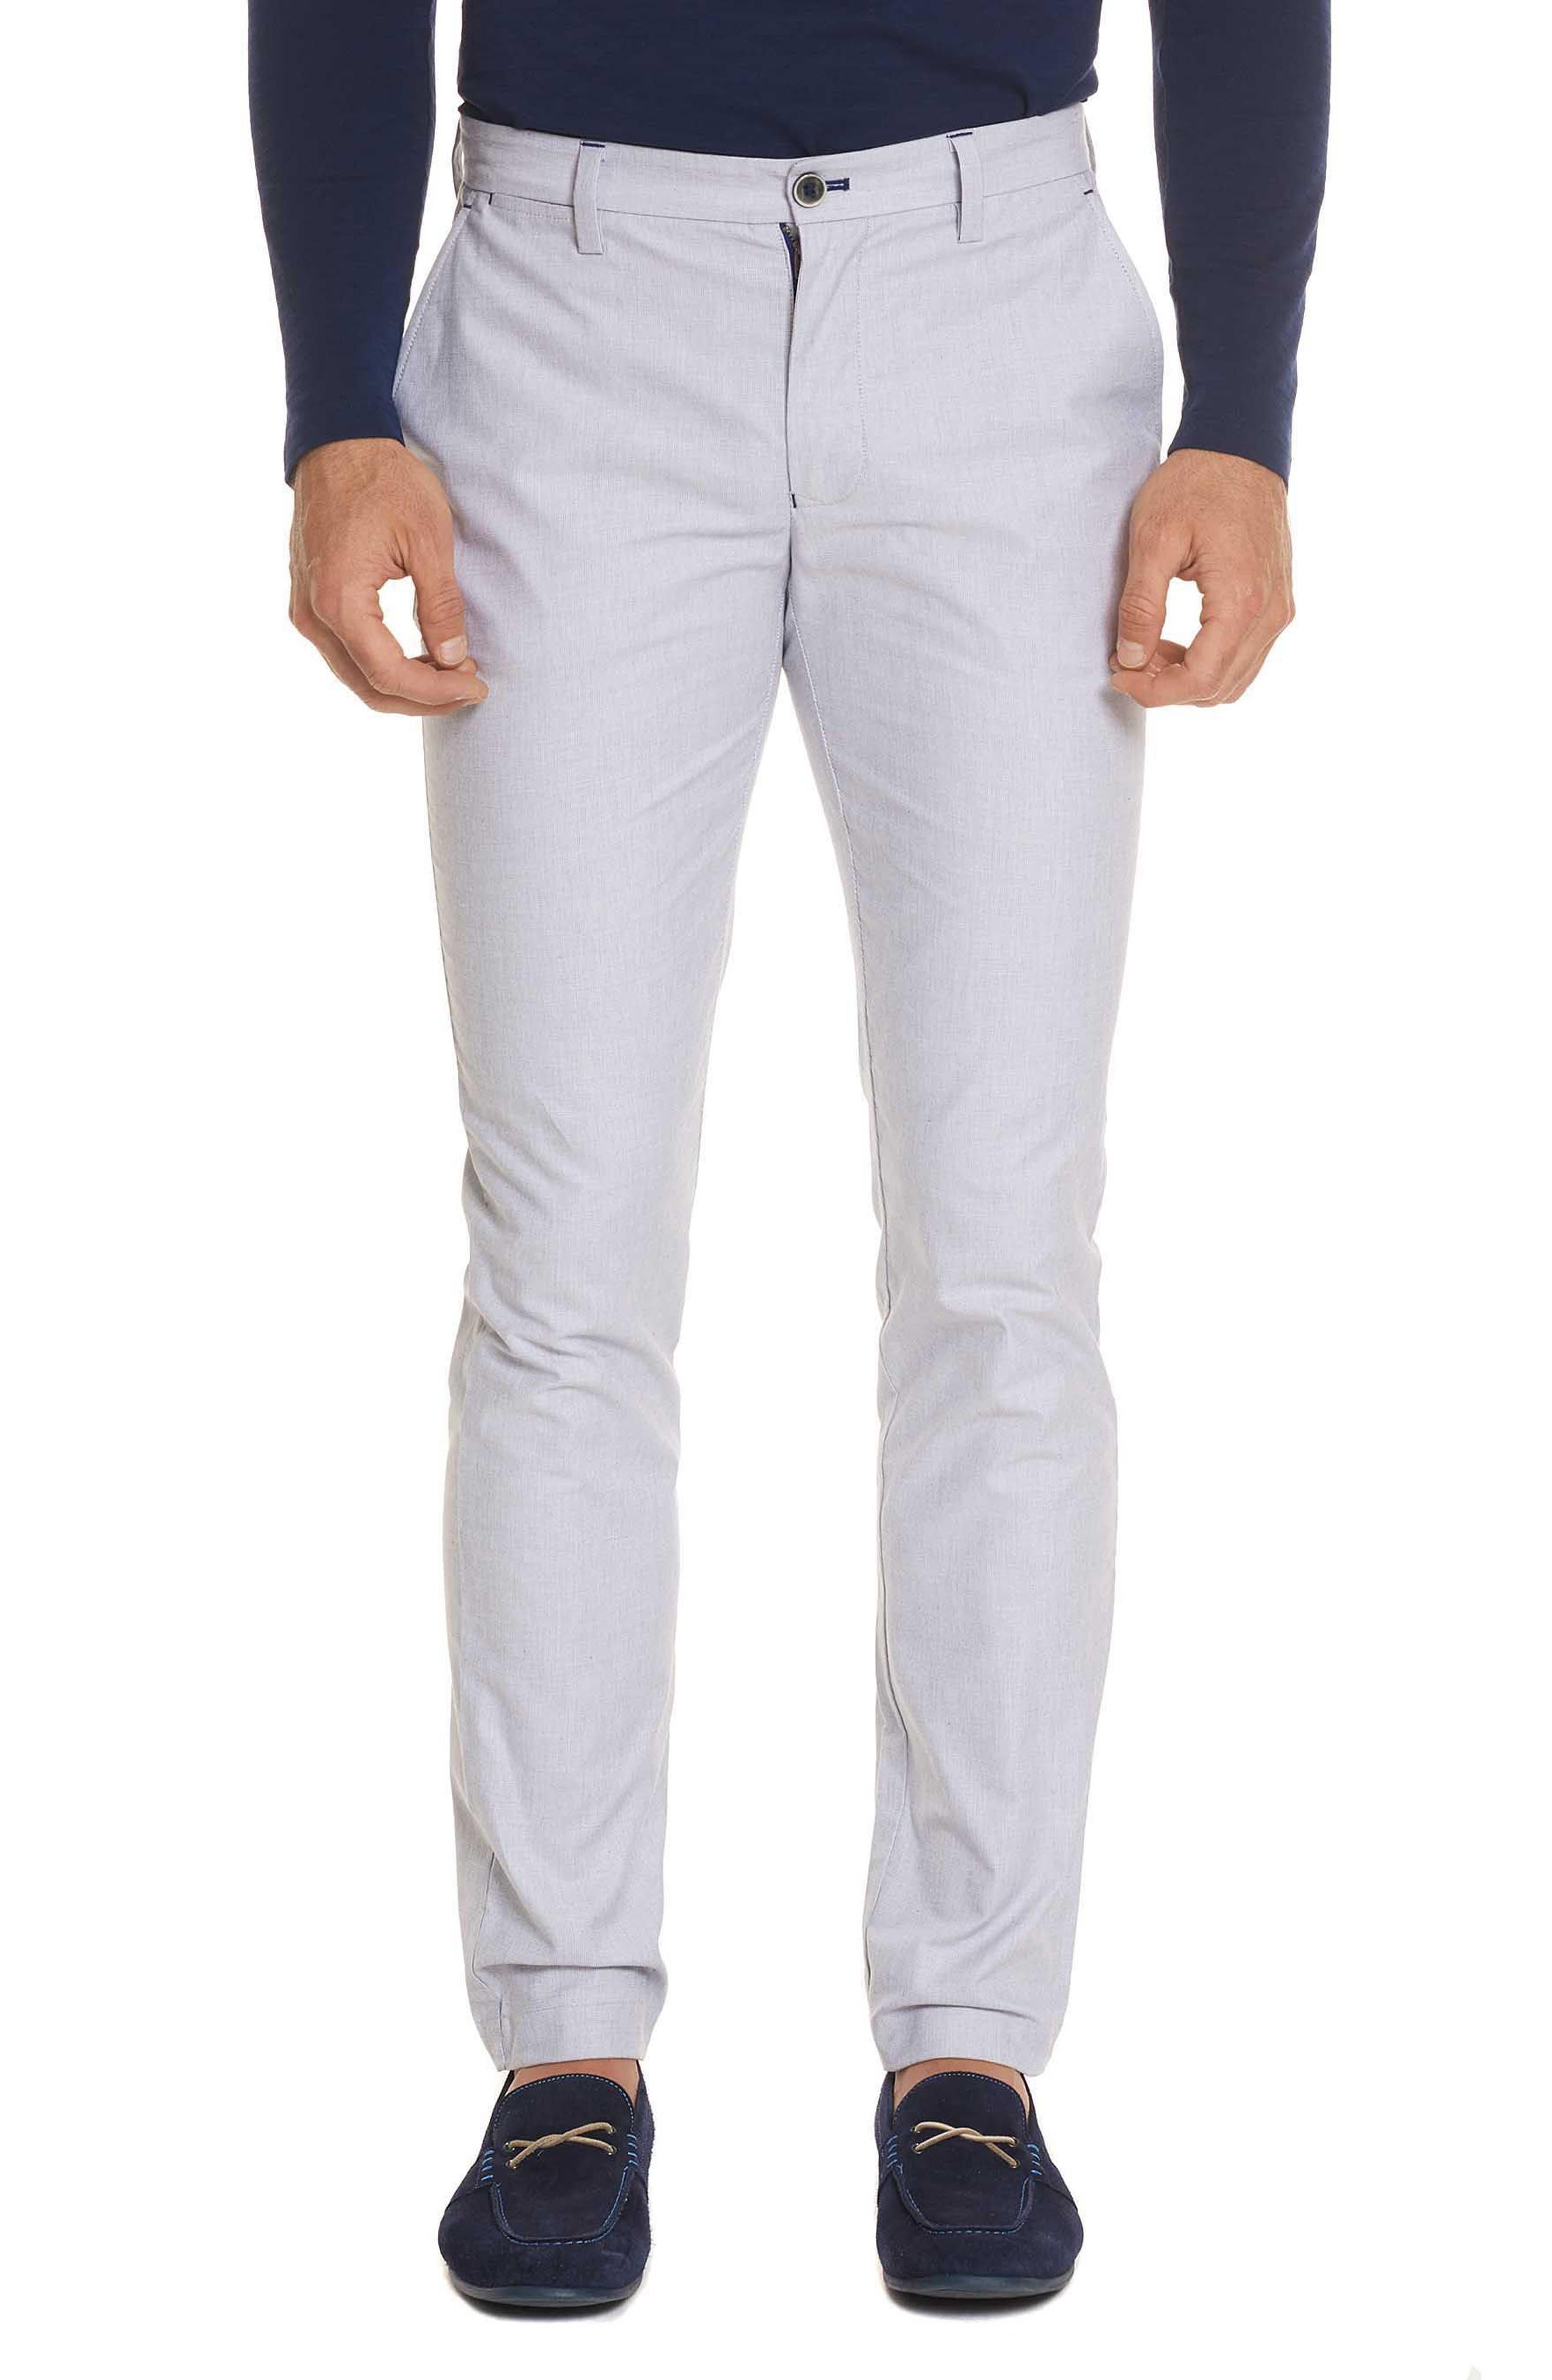 Gerardo Tailored Fit Pants,                         Main,                         color, 100